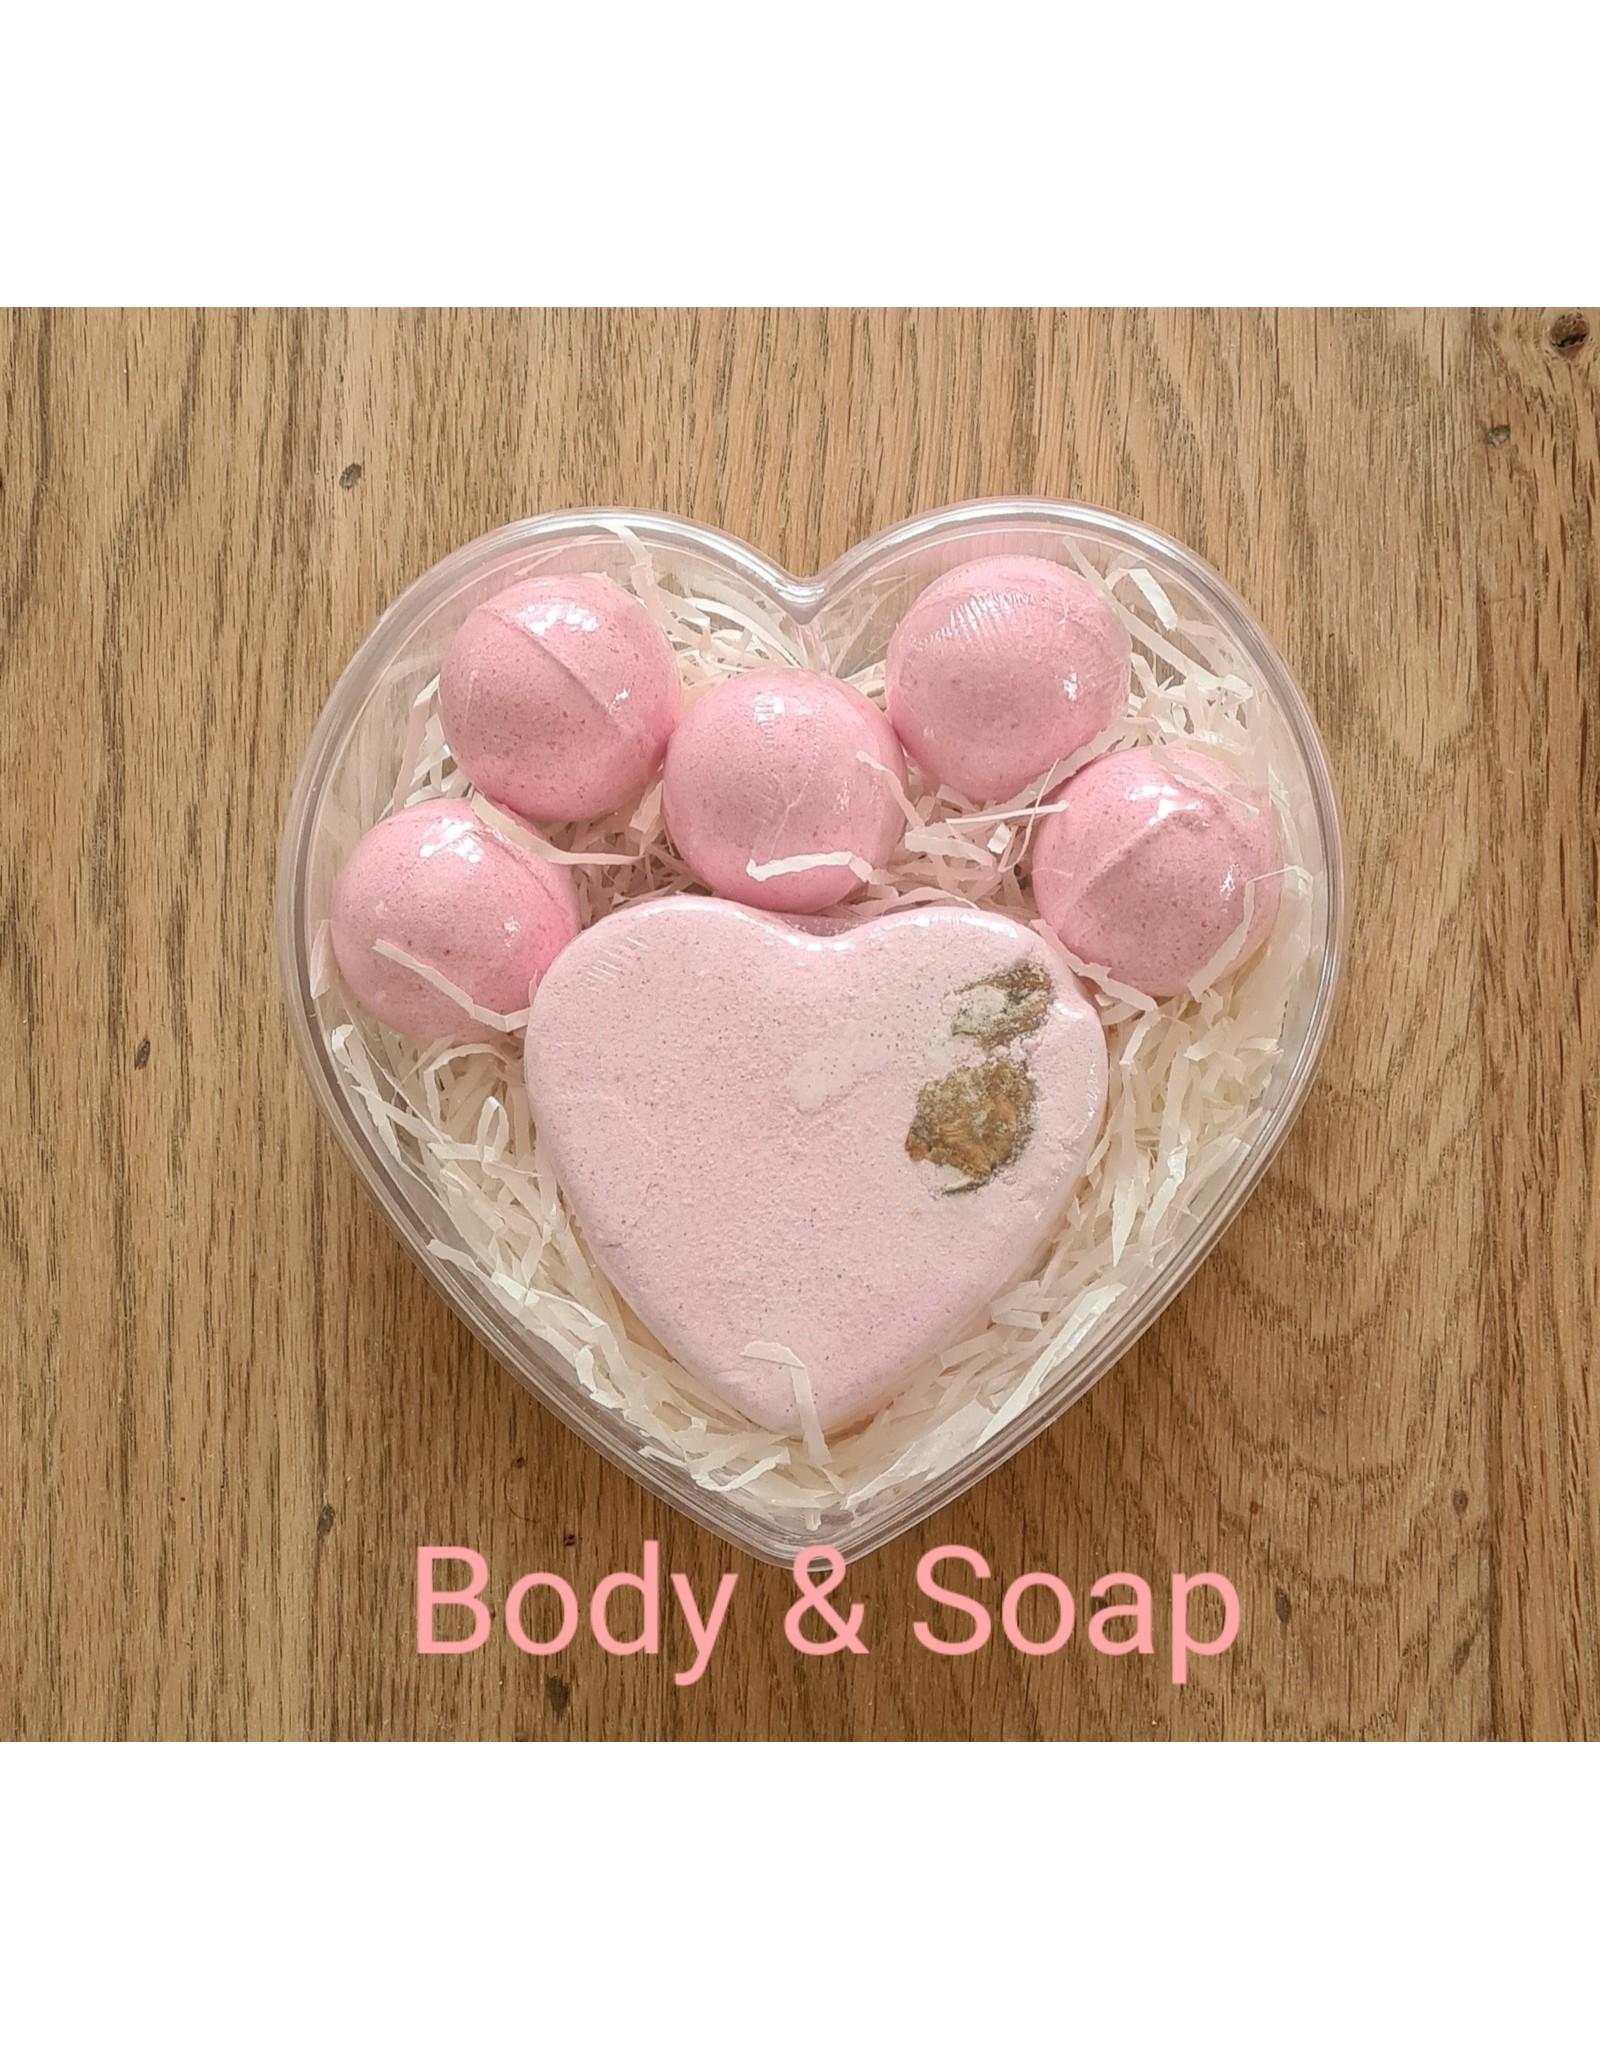 Body & Soap Een bruisend hart❤  - Body & Soap